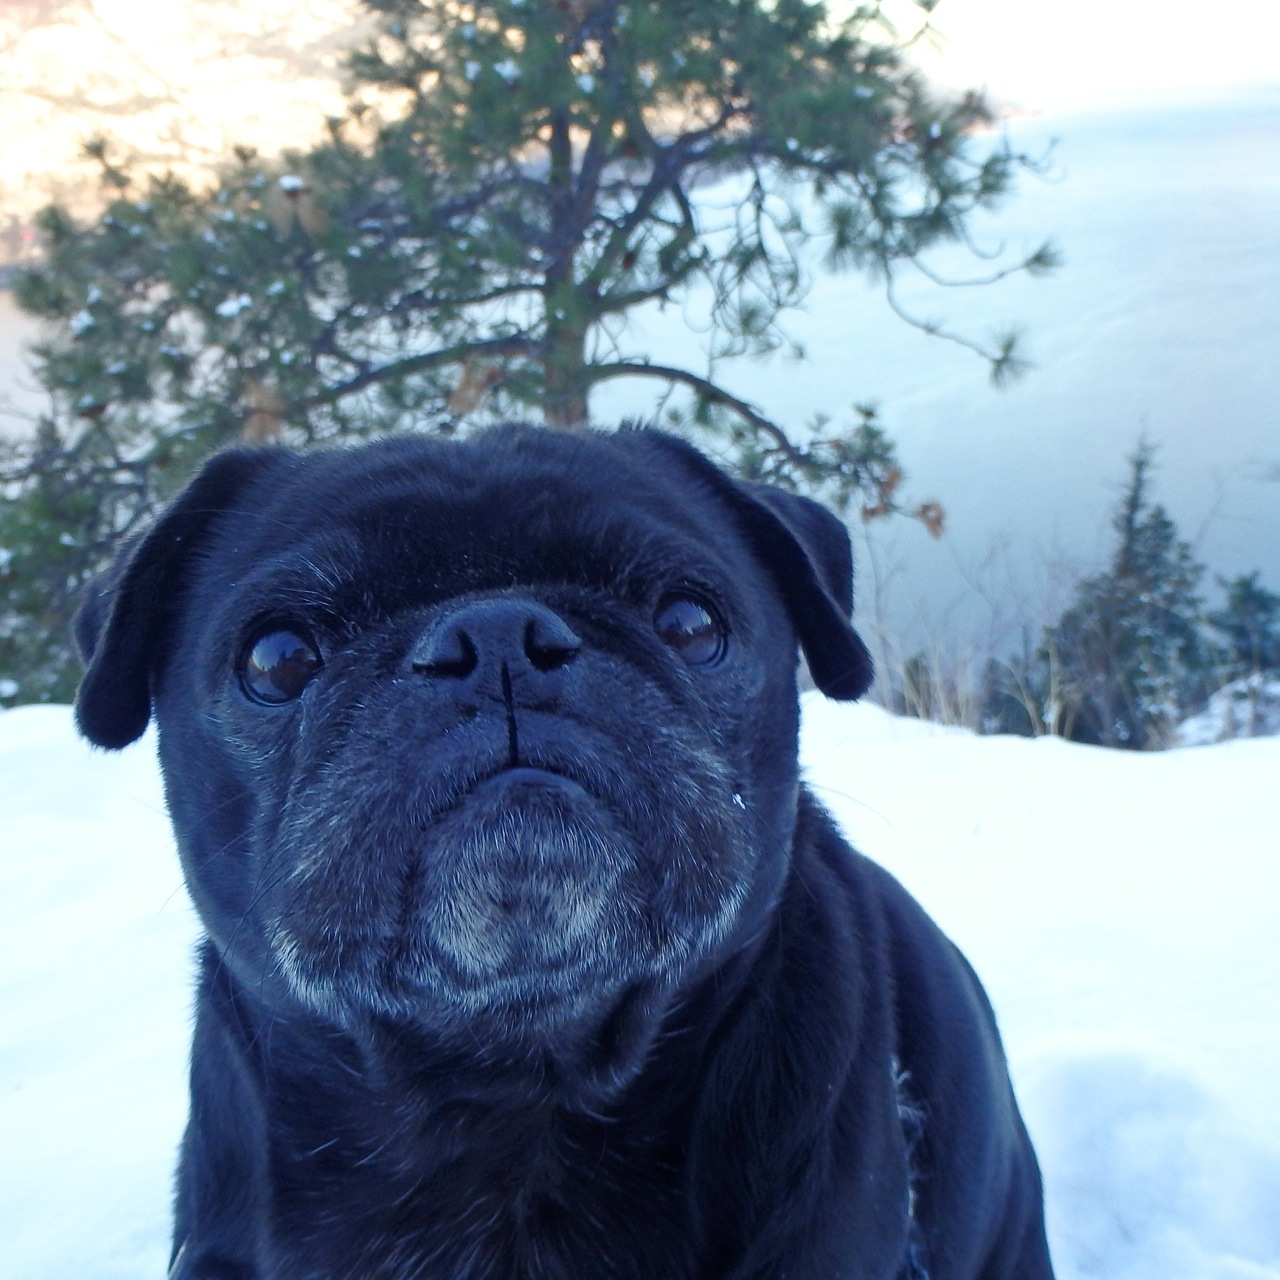 Winter Mountain Meditation (With Pug)